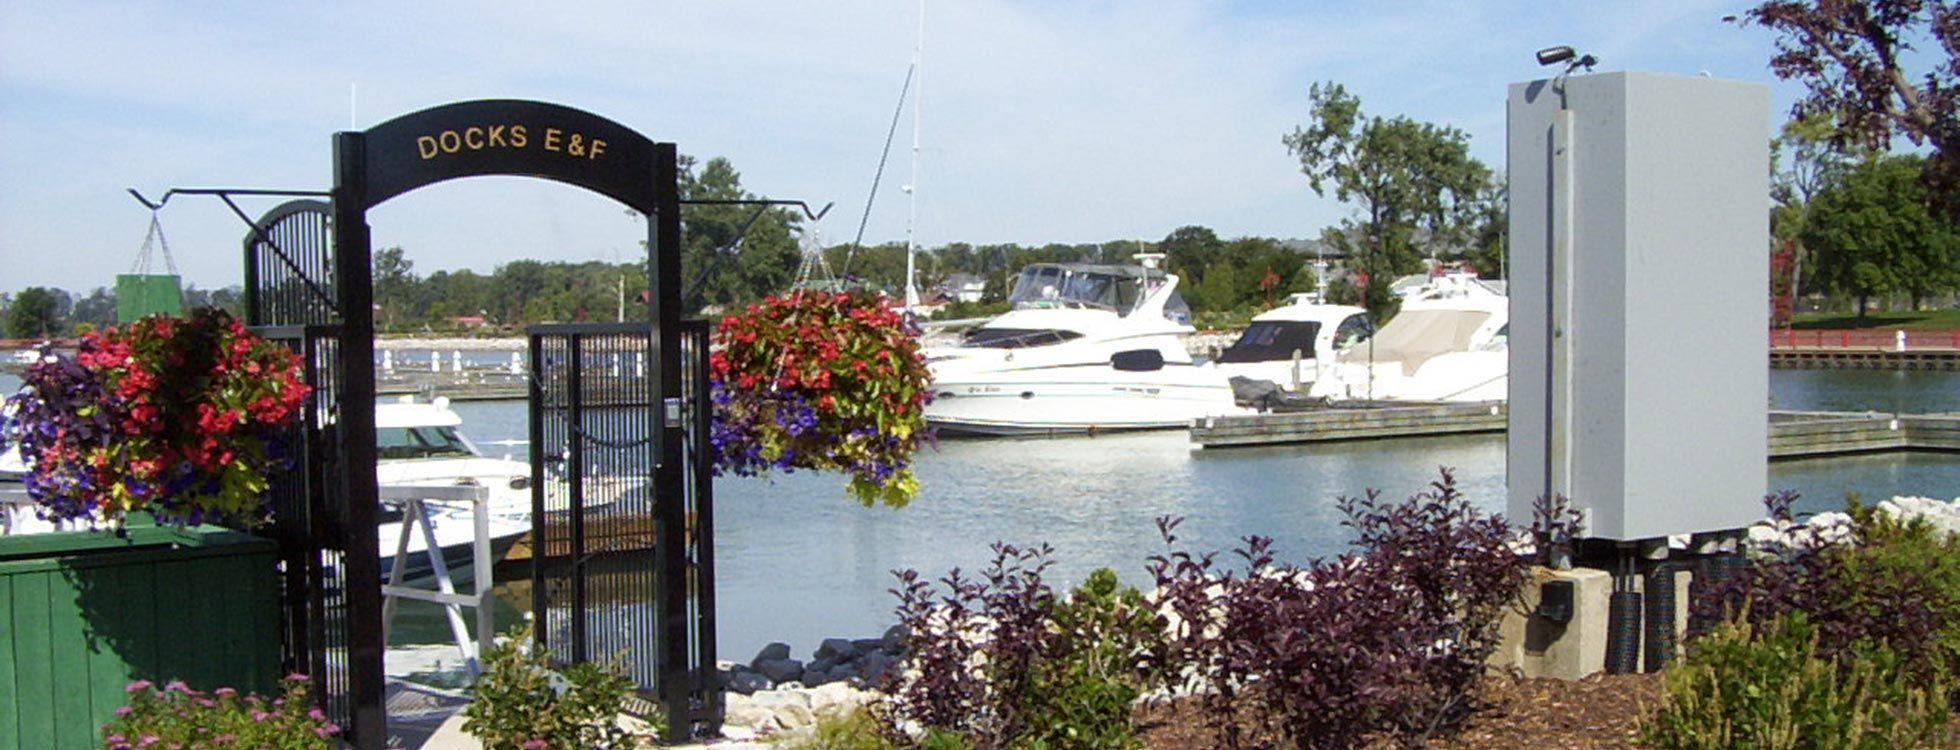 Community Windsor Axiom Mortgage Solutions